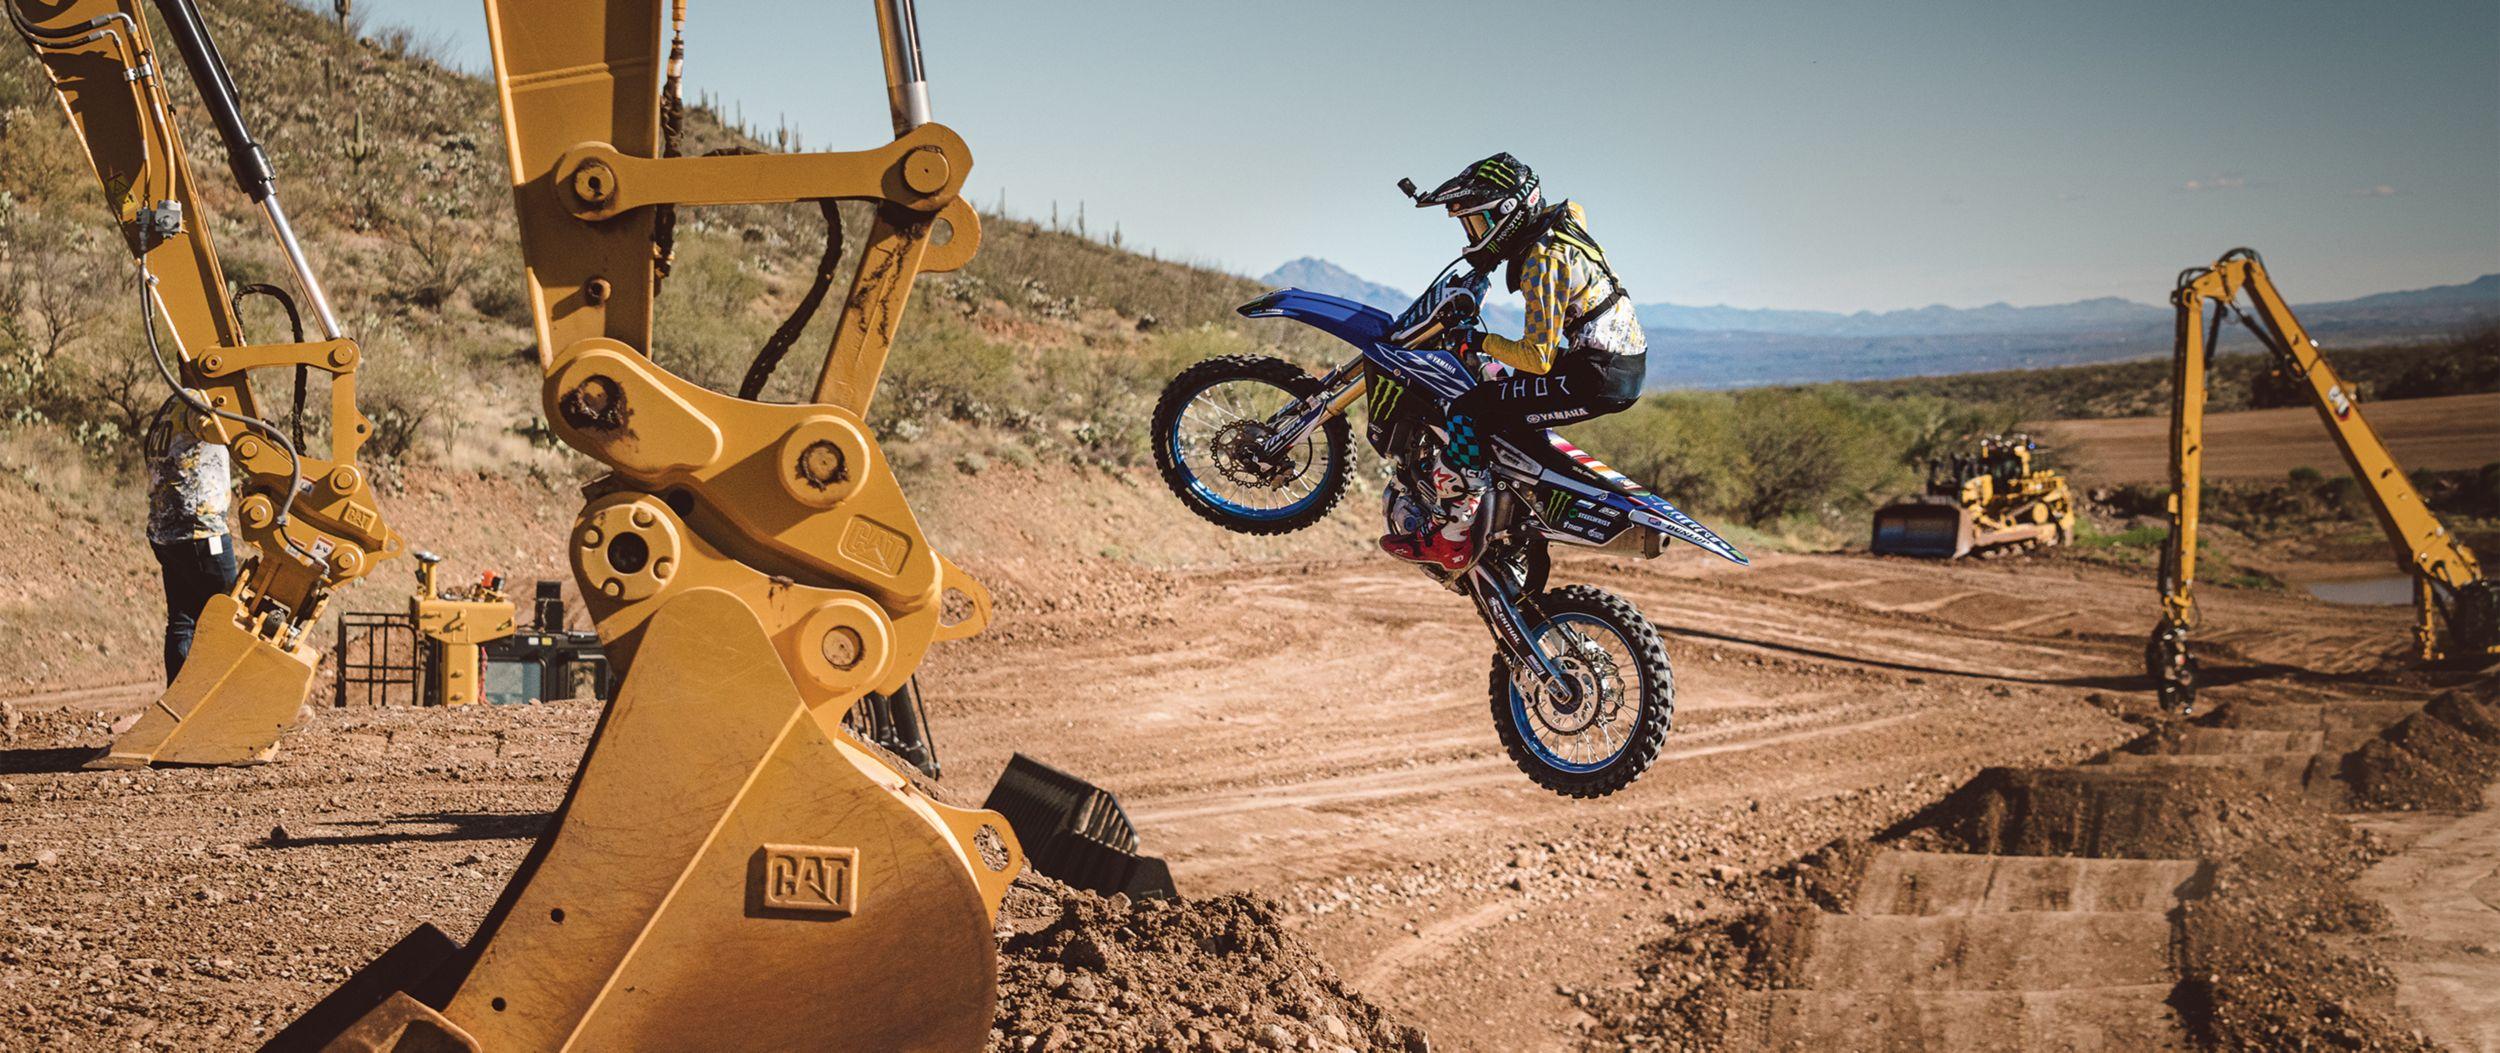 Motocross and Cat® Equipment